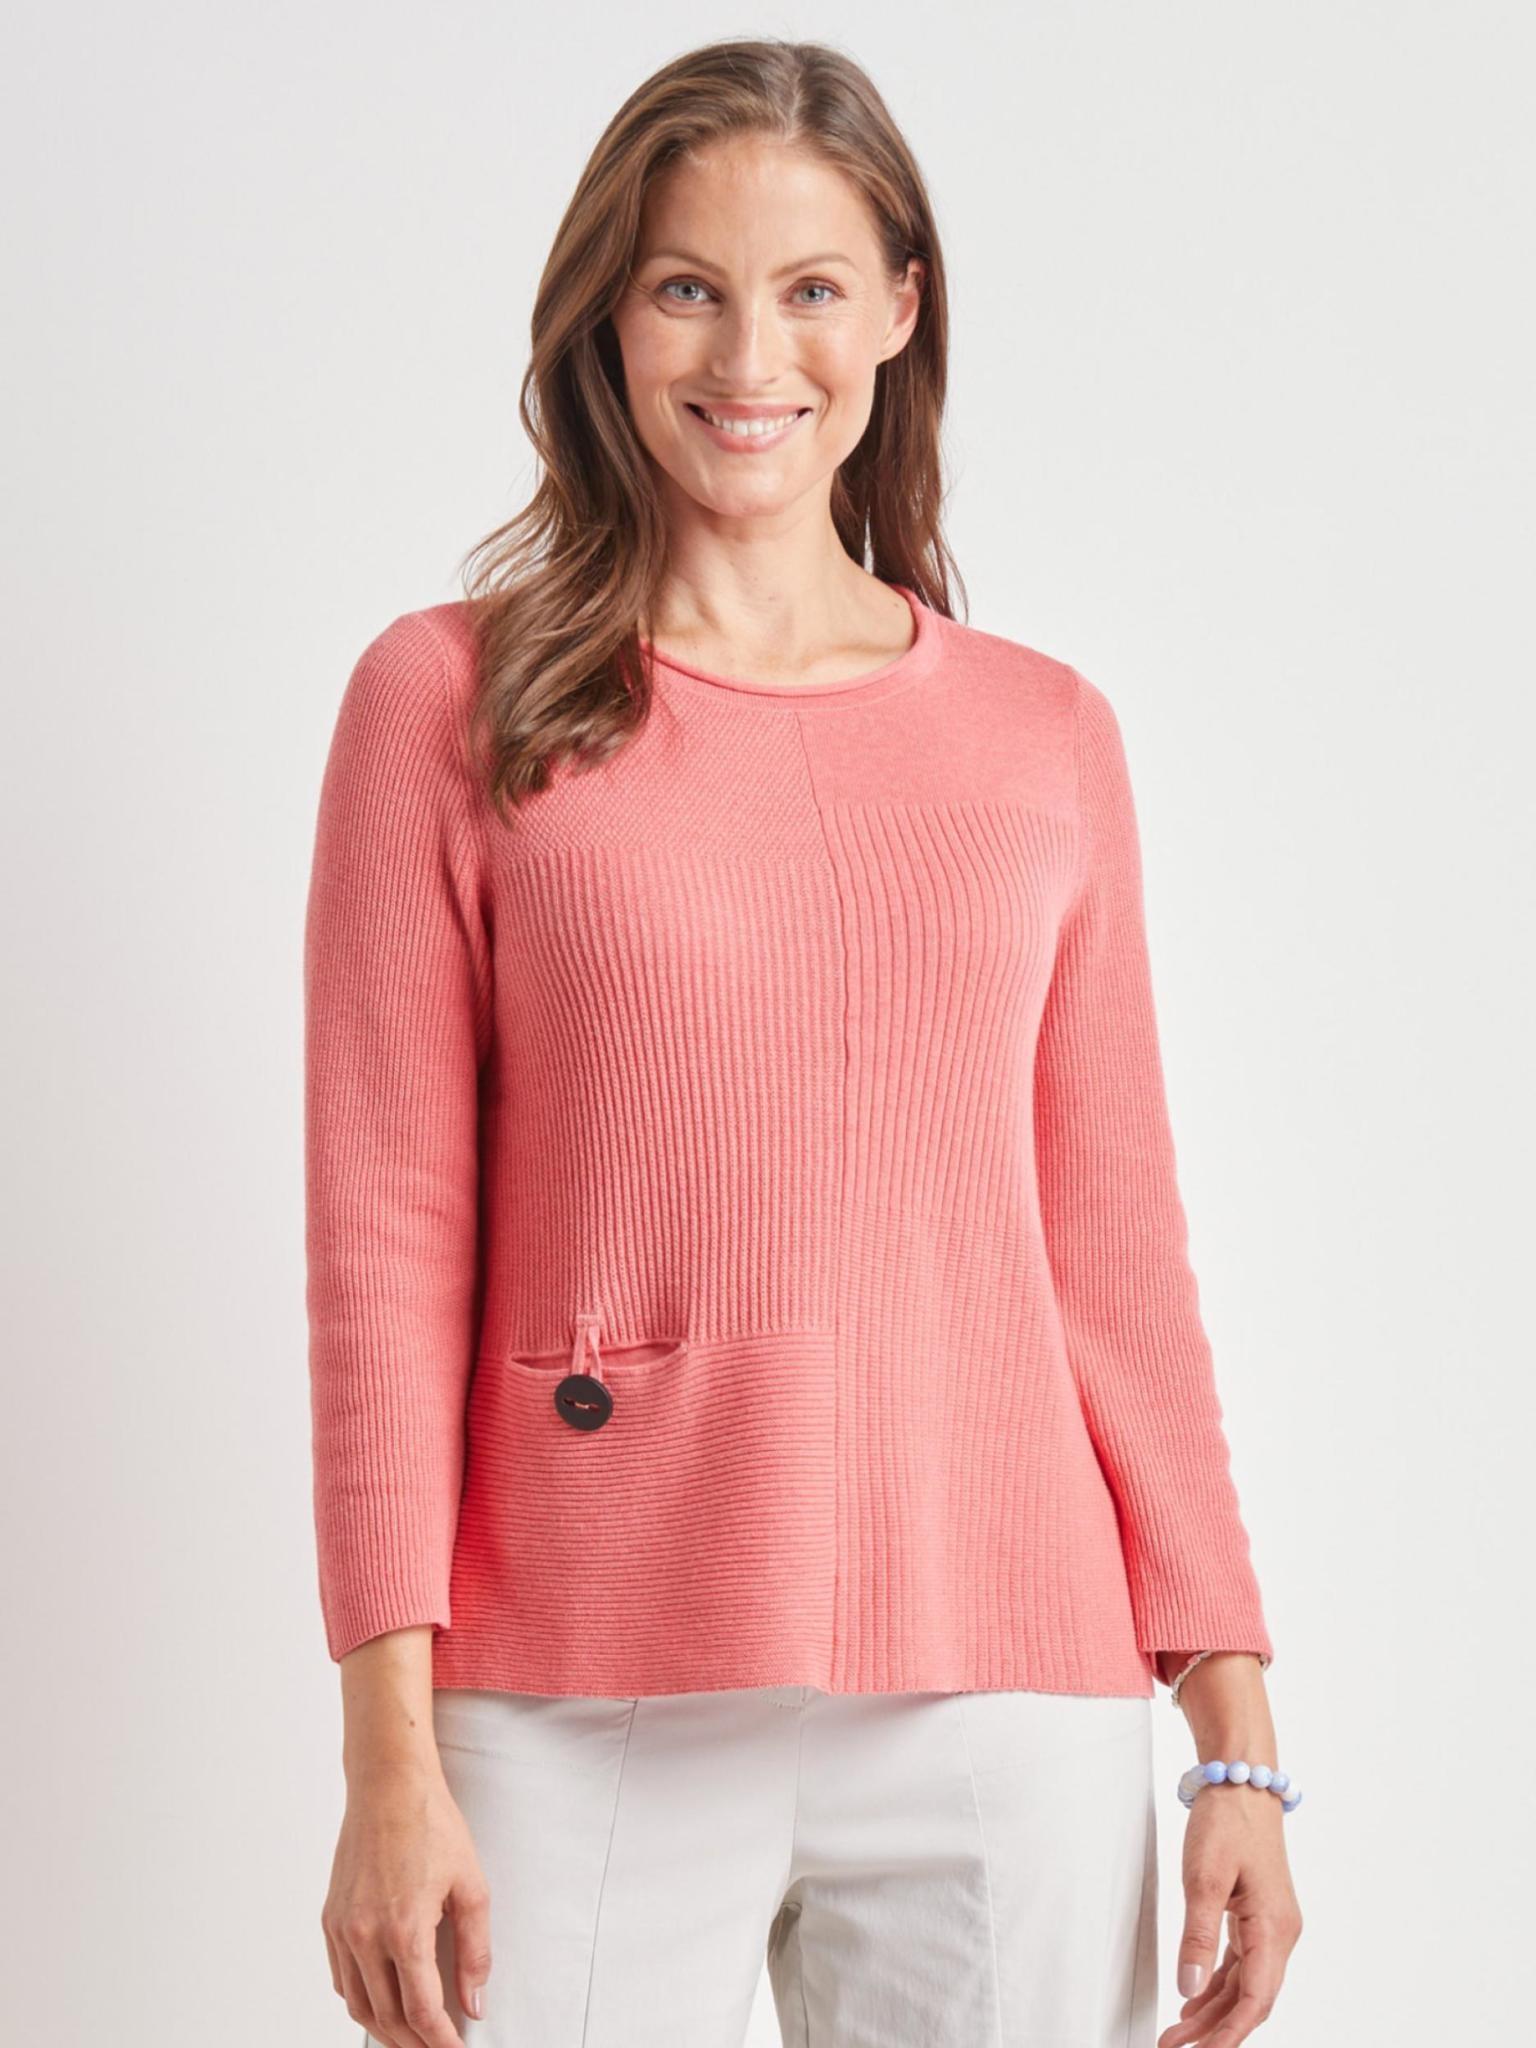 Habitat Mix Stitch Pullover